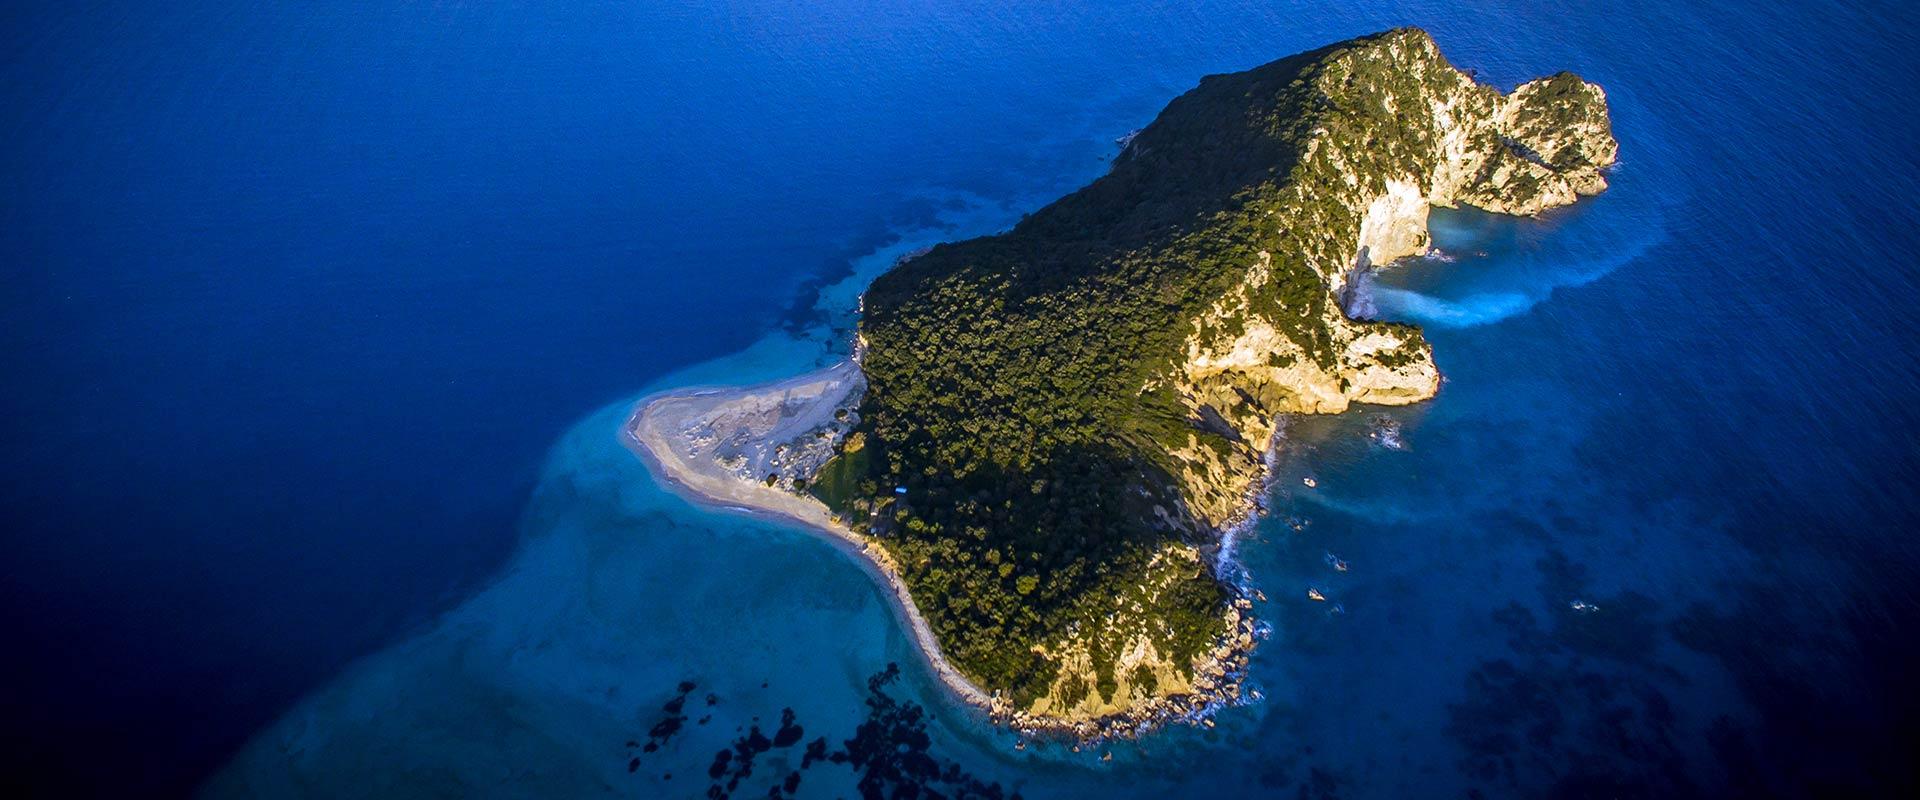 marine park zante